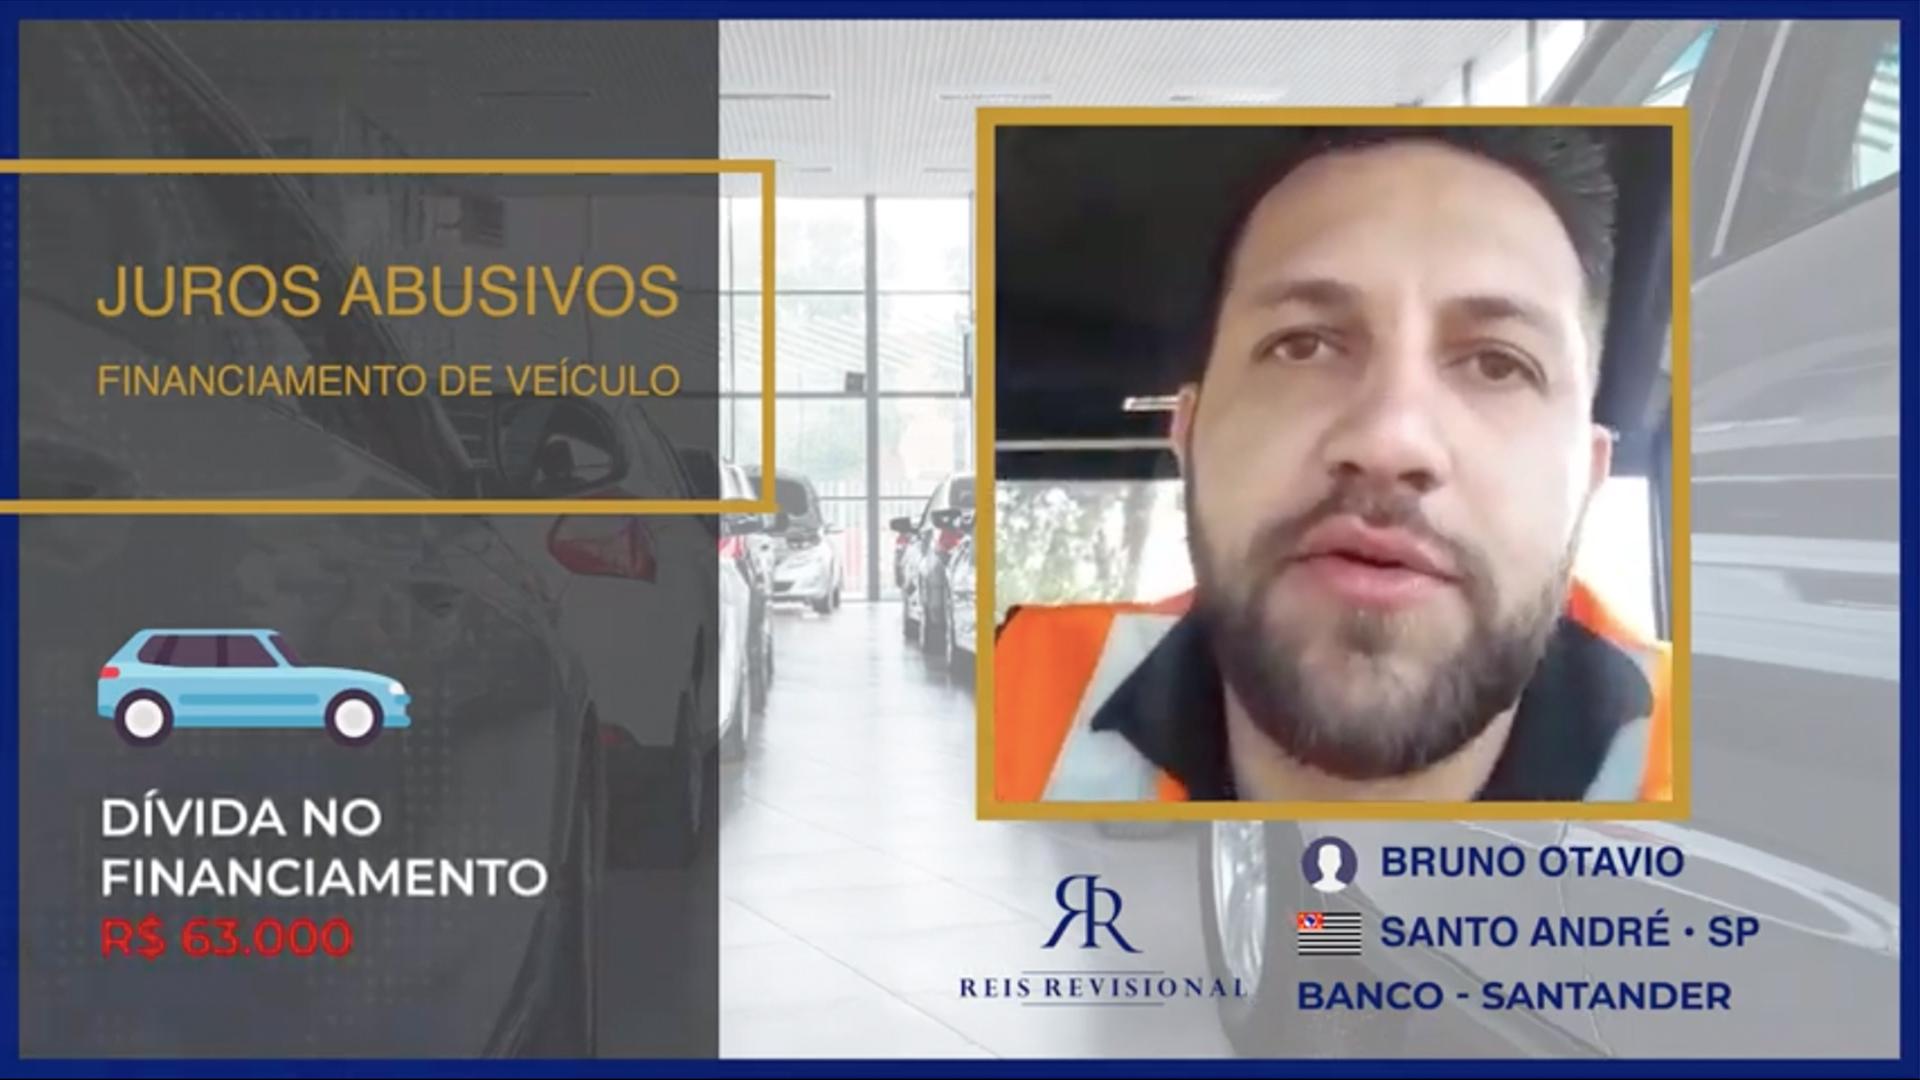 Bruno Otavio - Cliente Satisfeito